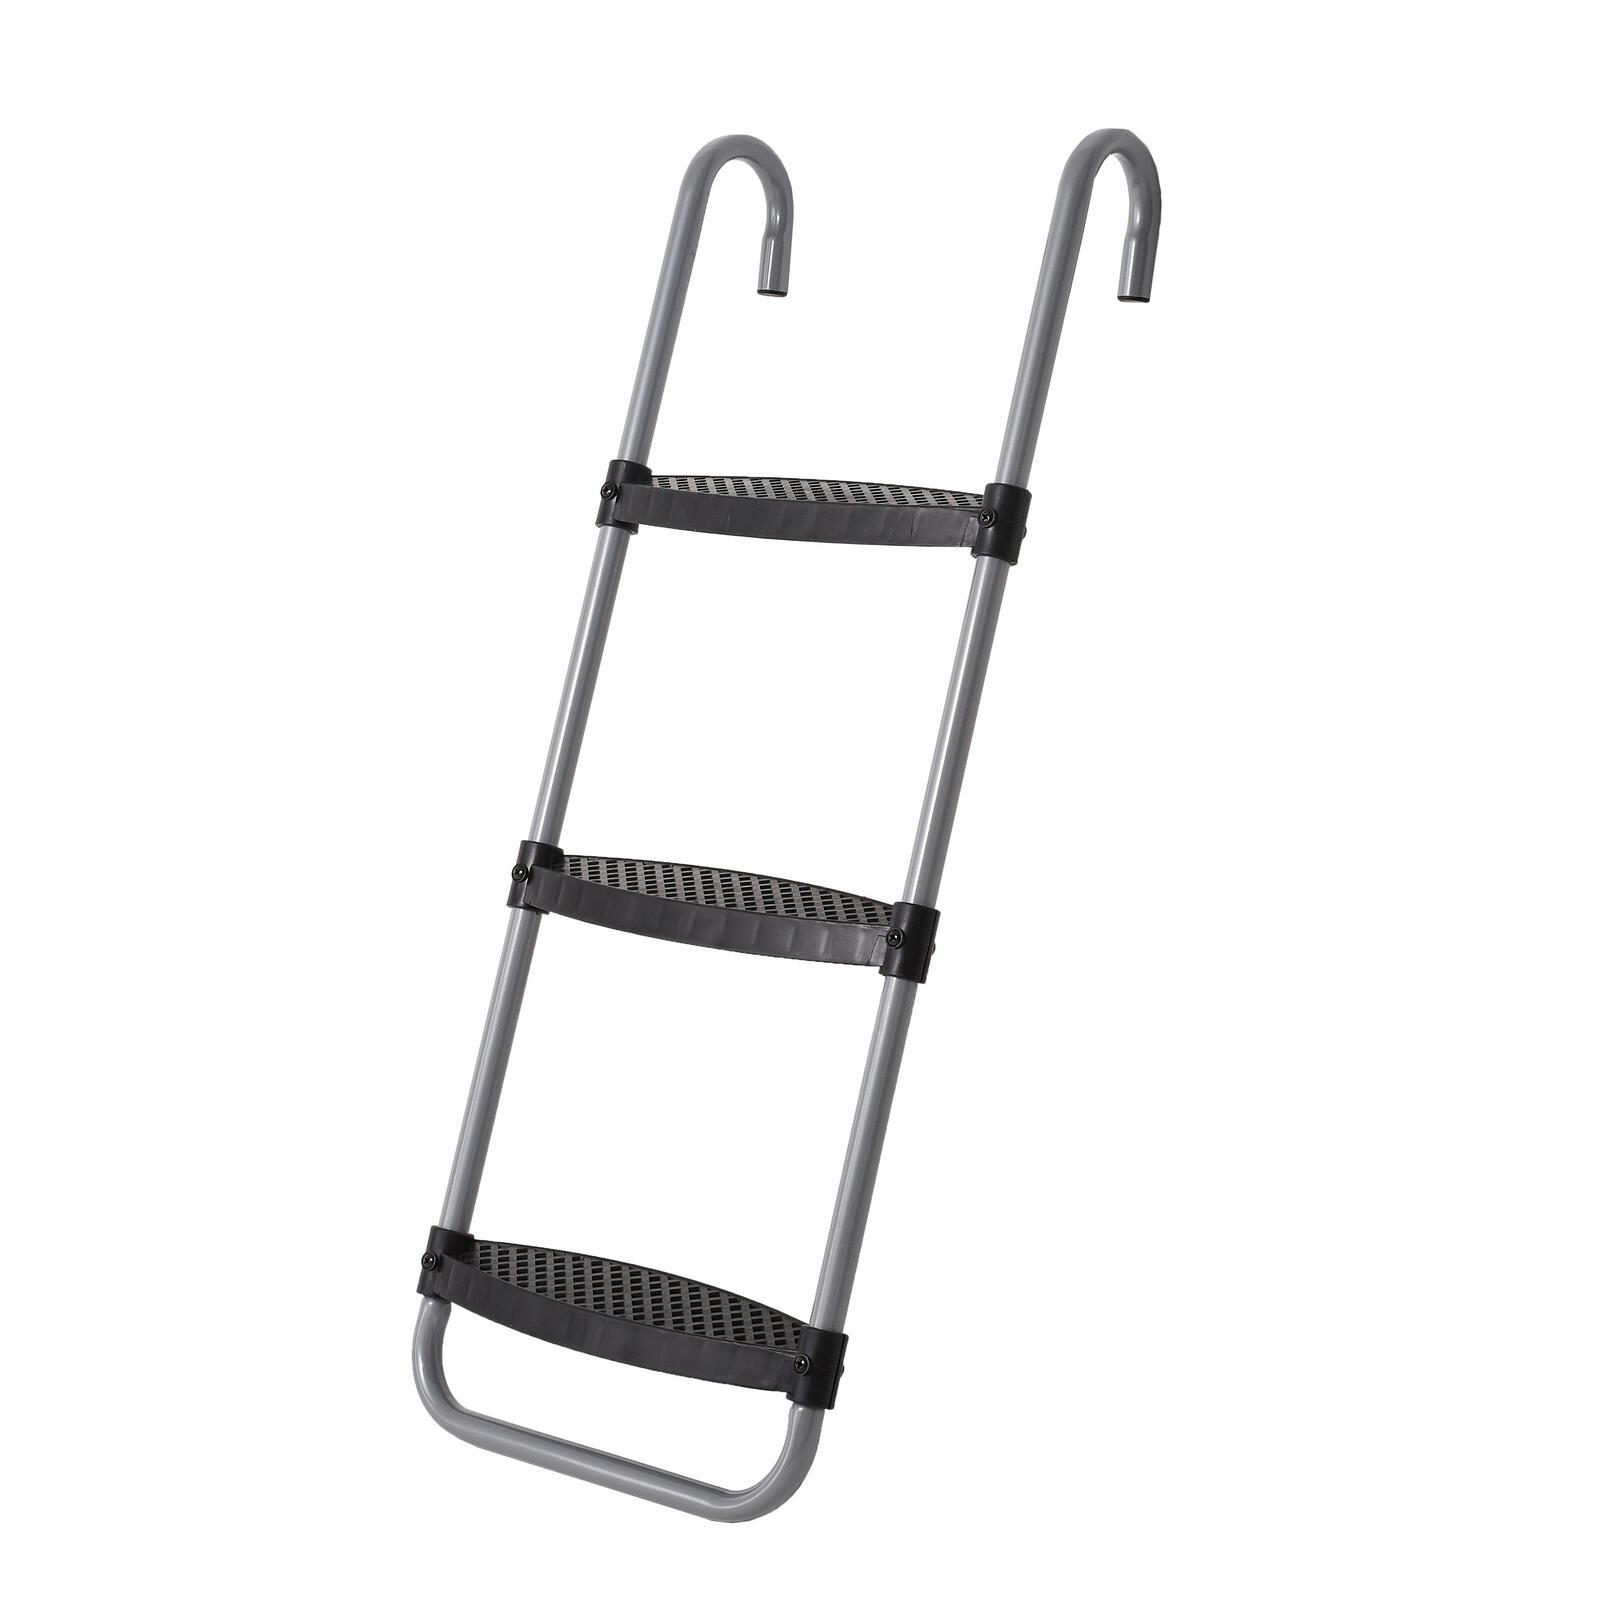 Ladder for 365, 420 & 520 trampolines